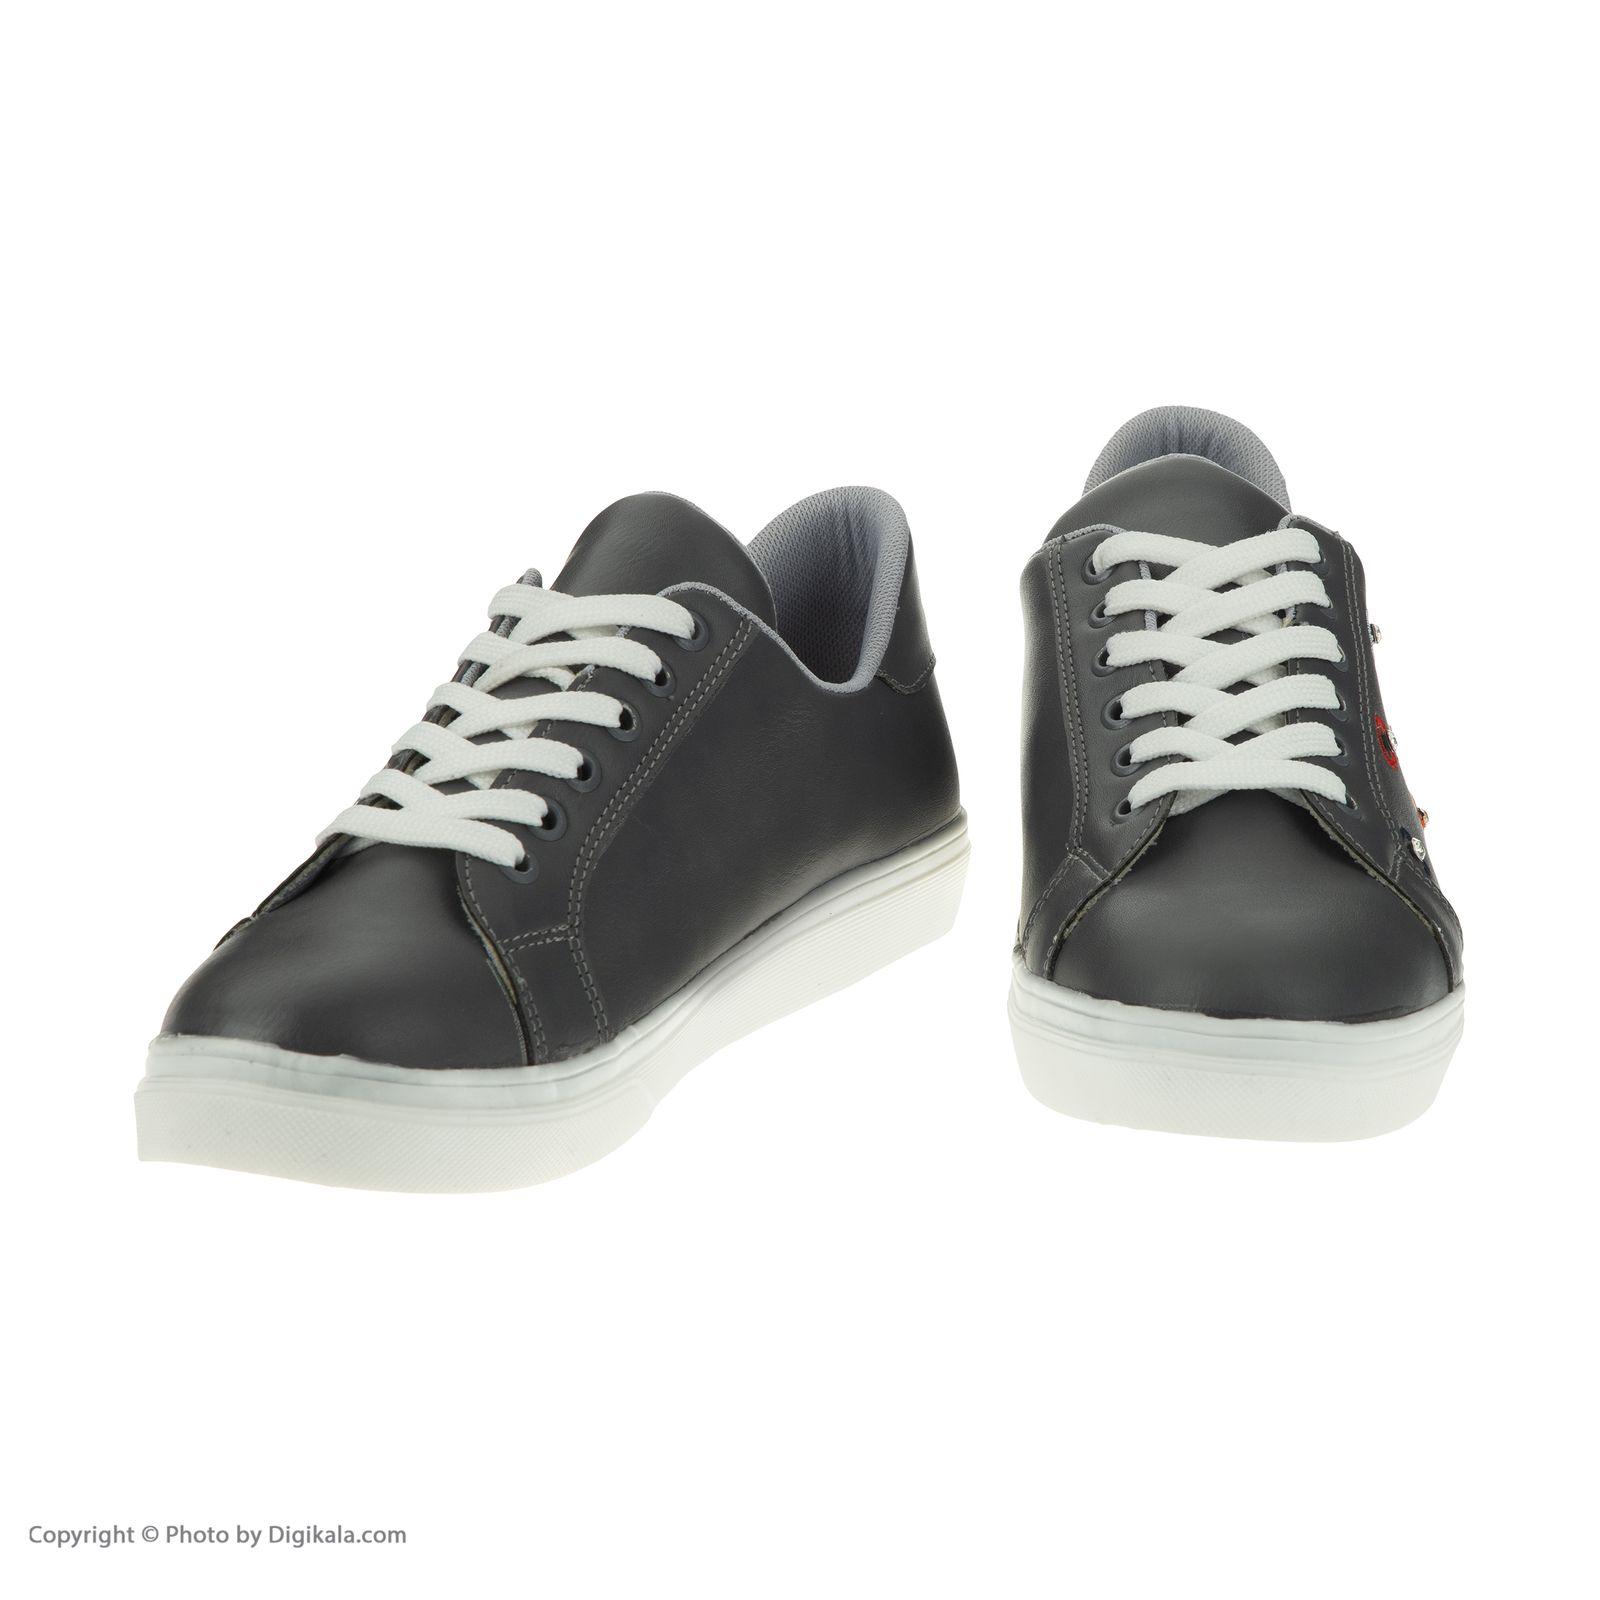 کفش روزمره زنانه مدل 4013 -  - 4